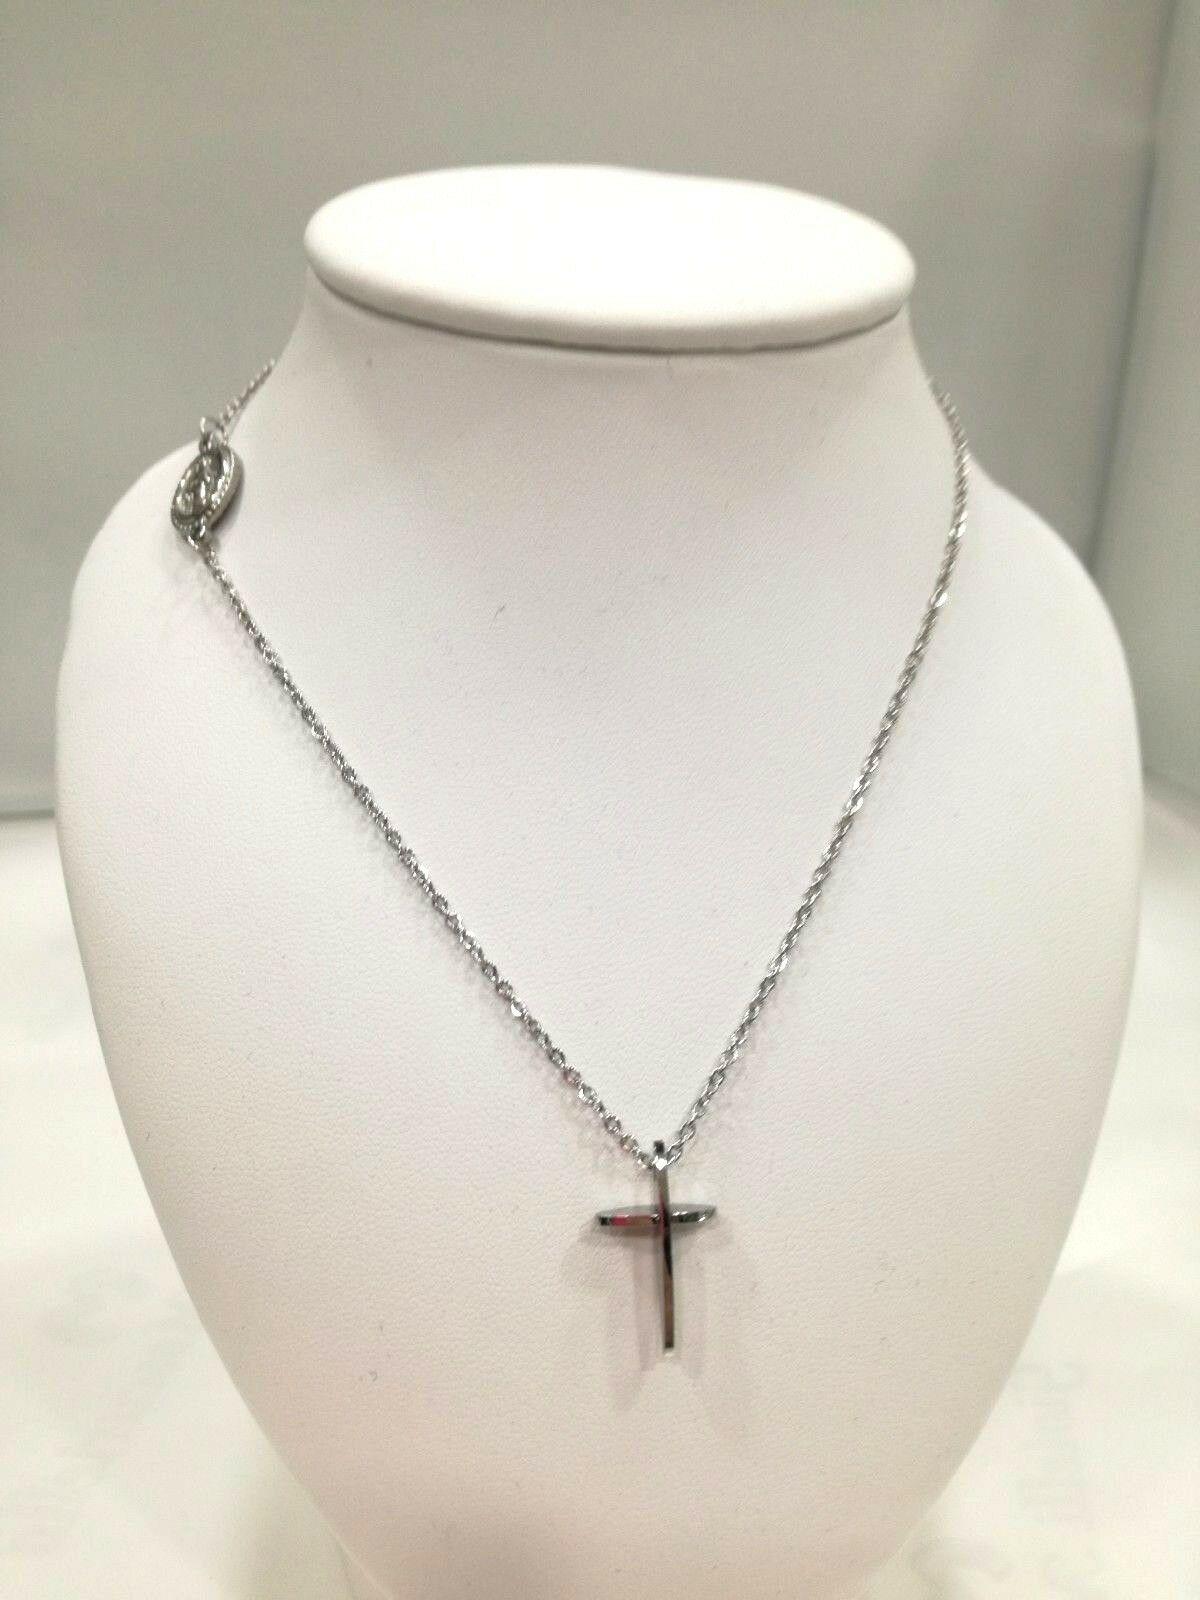 Collana sacra donna Manuel Zed con croce in acciaio Q2311_5500